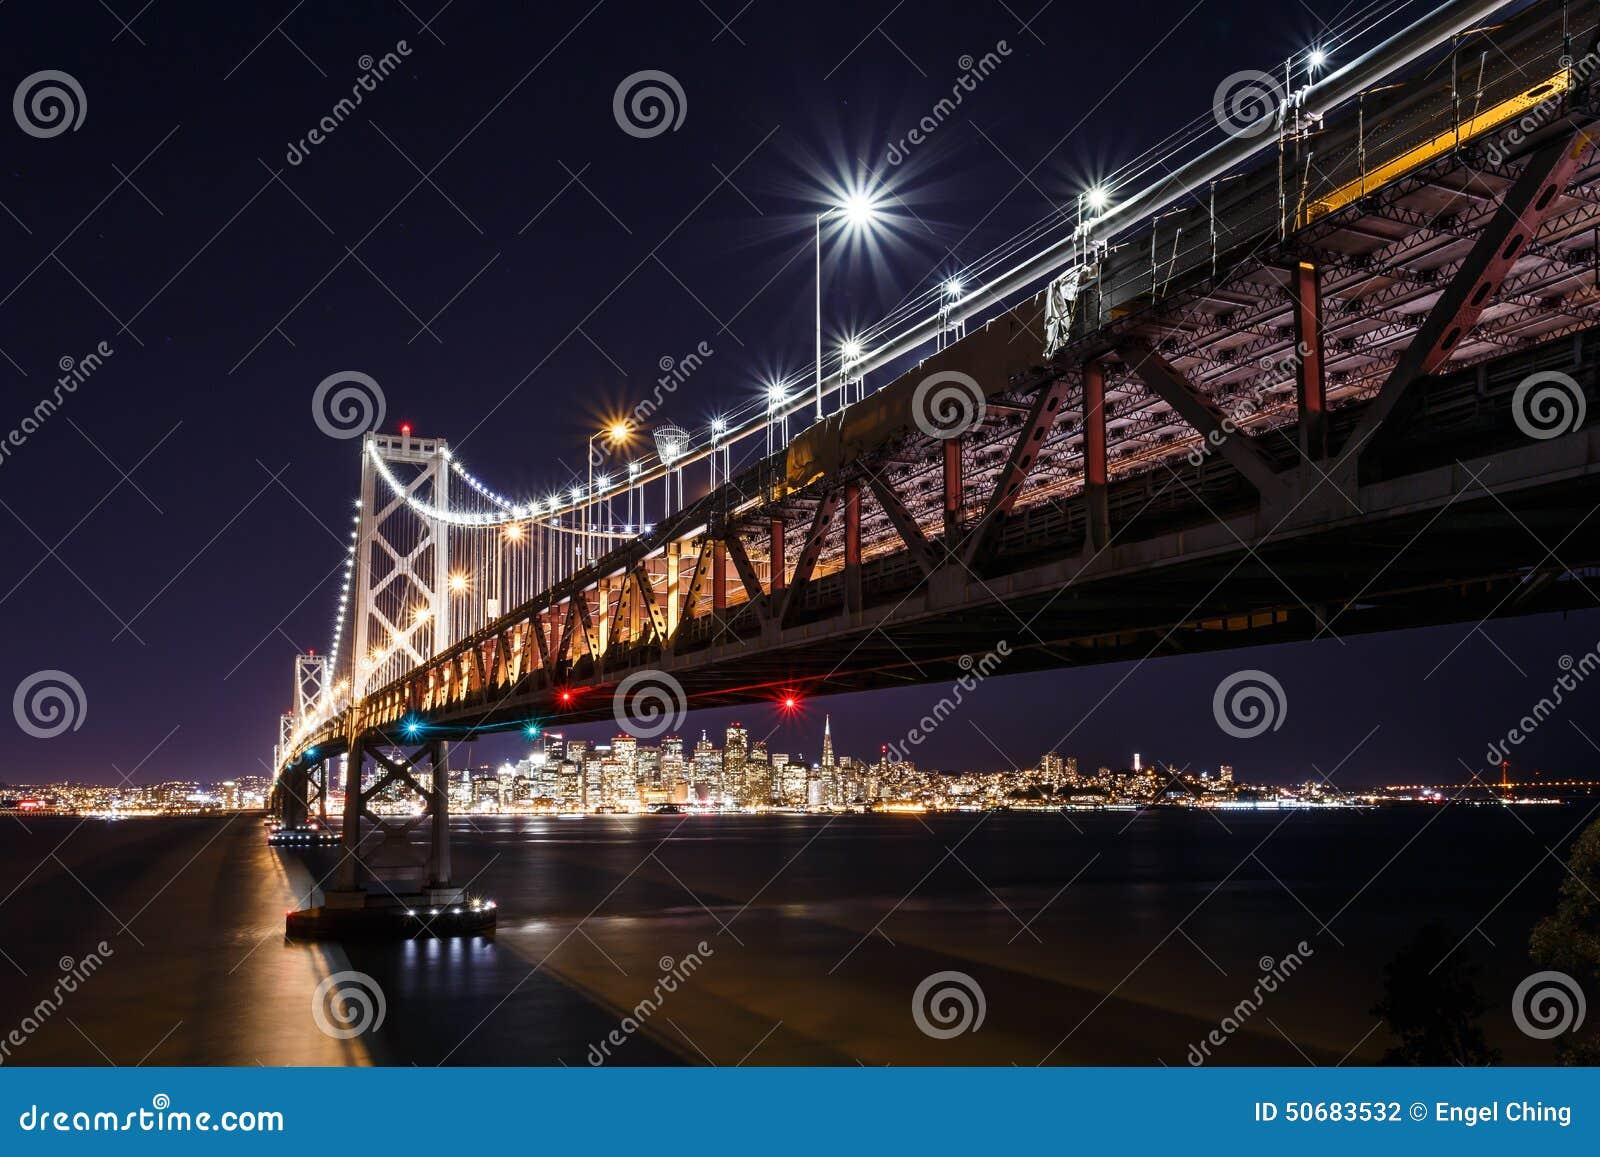 Download 旧金山湾桥梁在晚上 库存照片. 图片 包括有 暂停, 照亮, 黄昏, 加利福尼亚, 拱道, 小珠靠岸的, 晚上 - 50683532